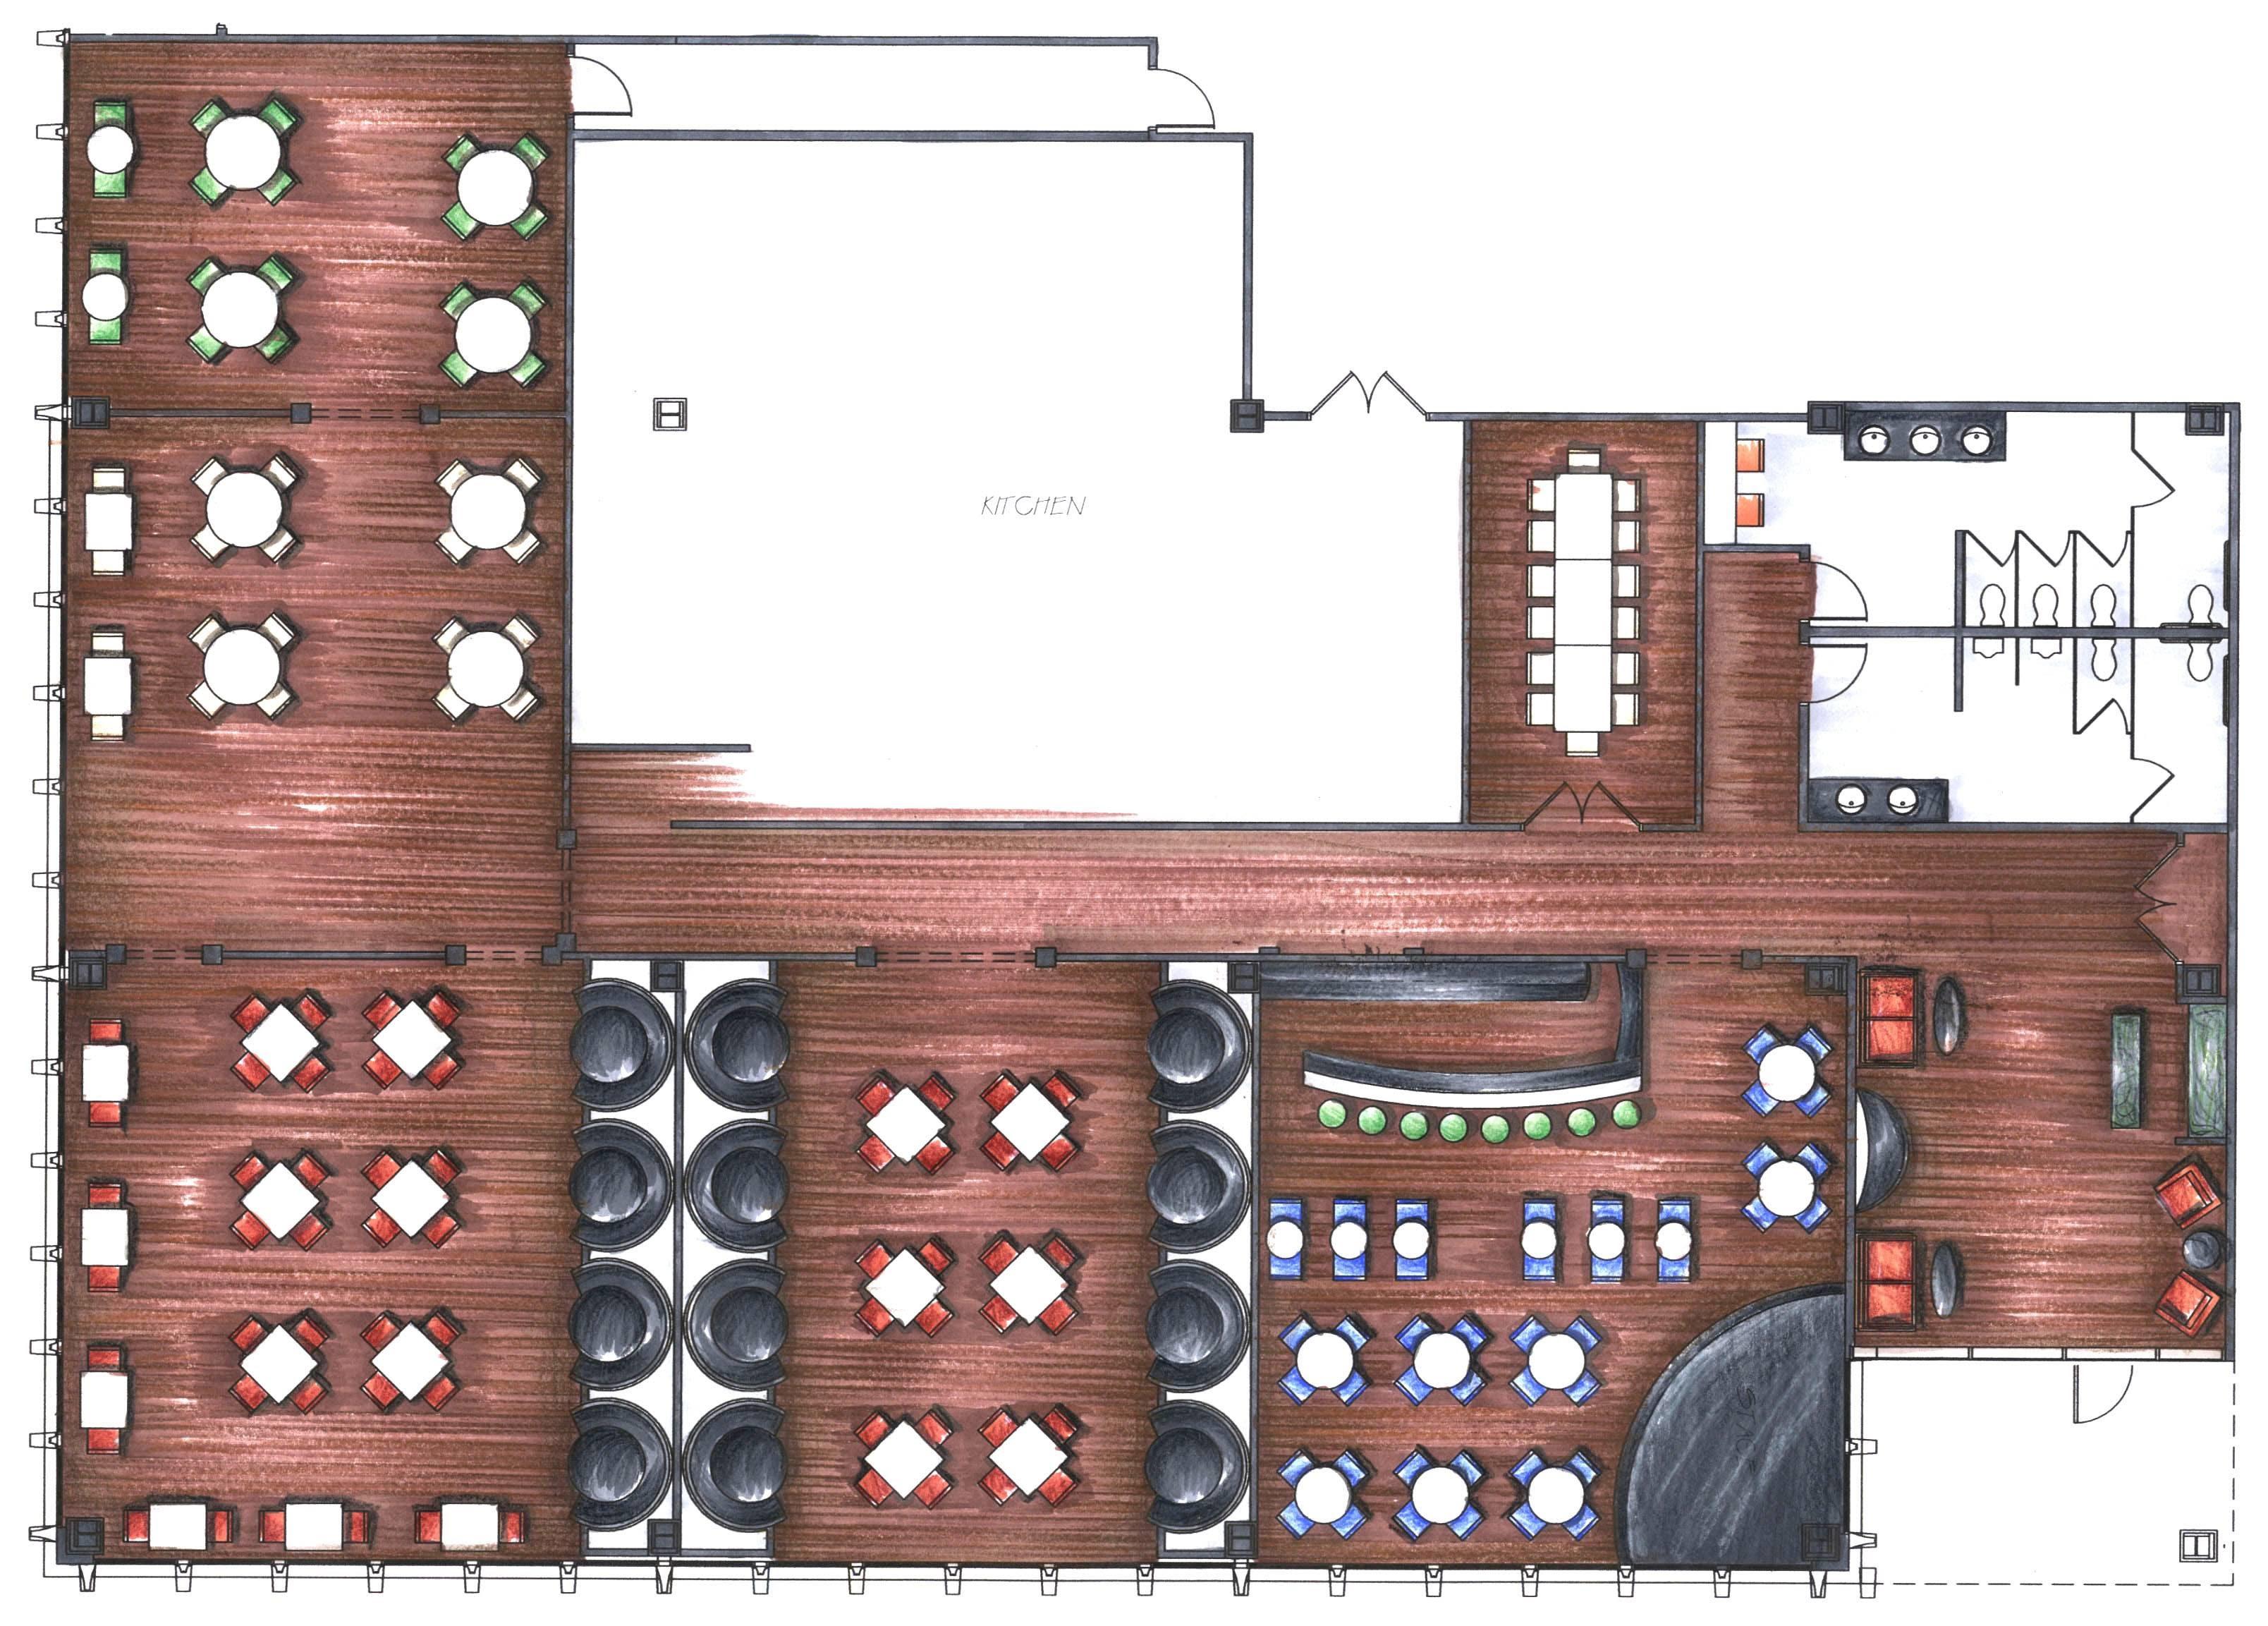 Restaurant floor plan with bar